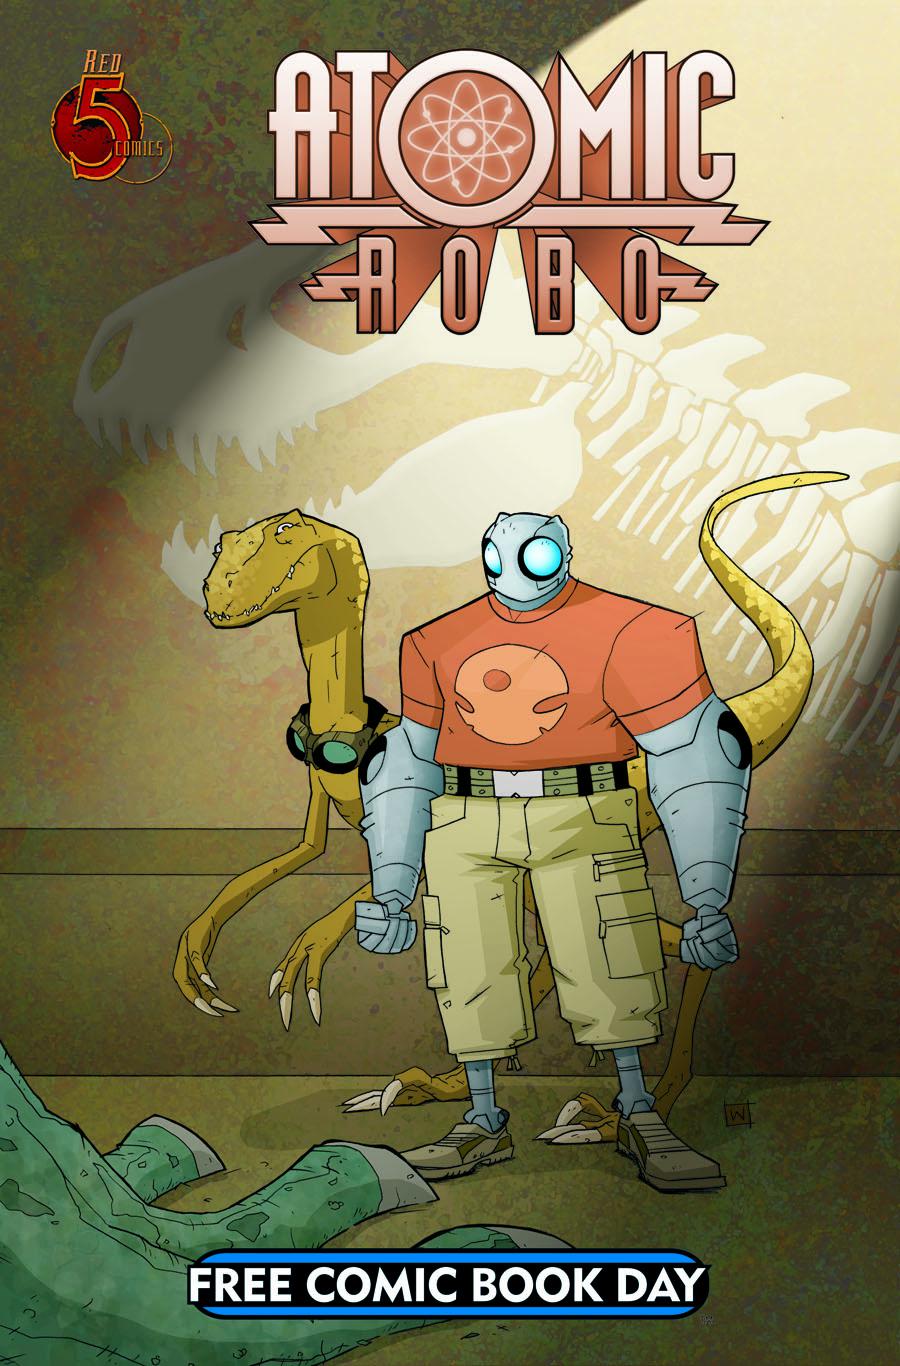 STK459153 Free Comic Book Day 2012: Reviews!